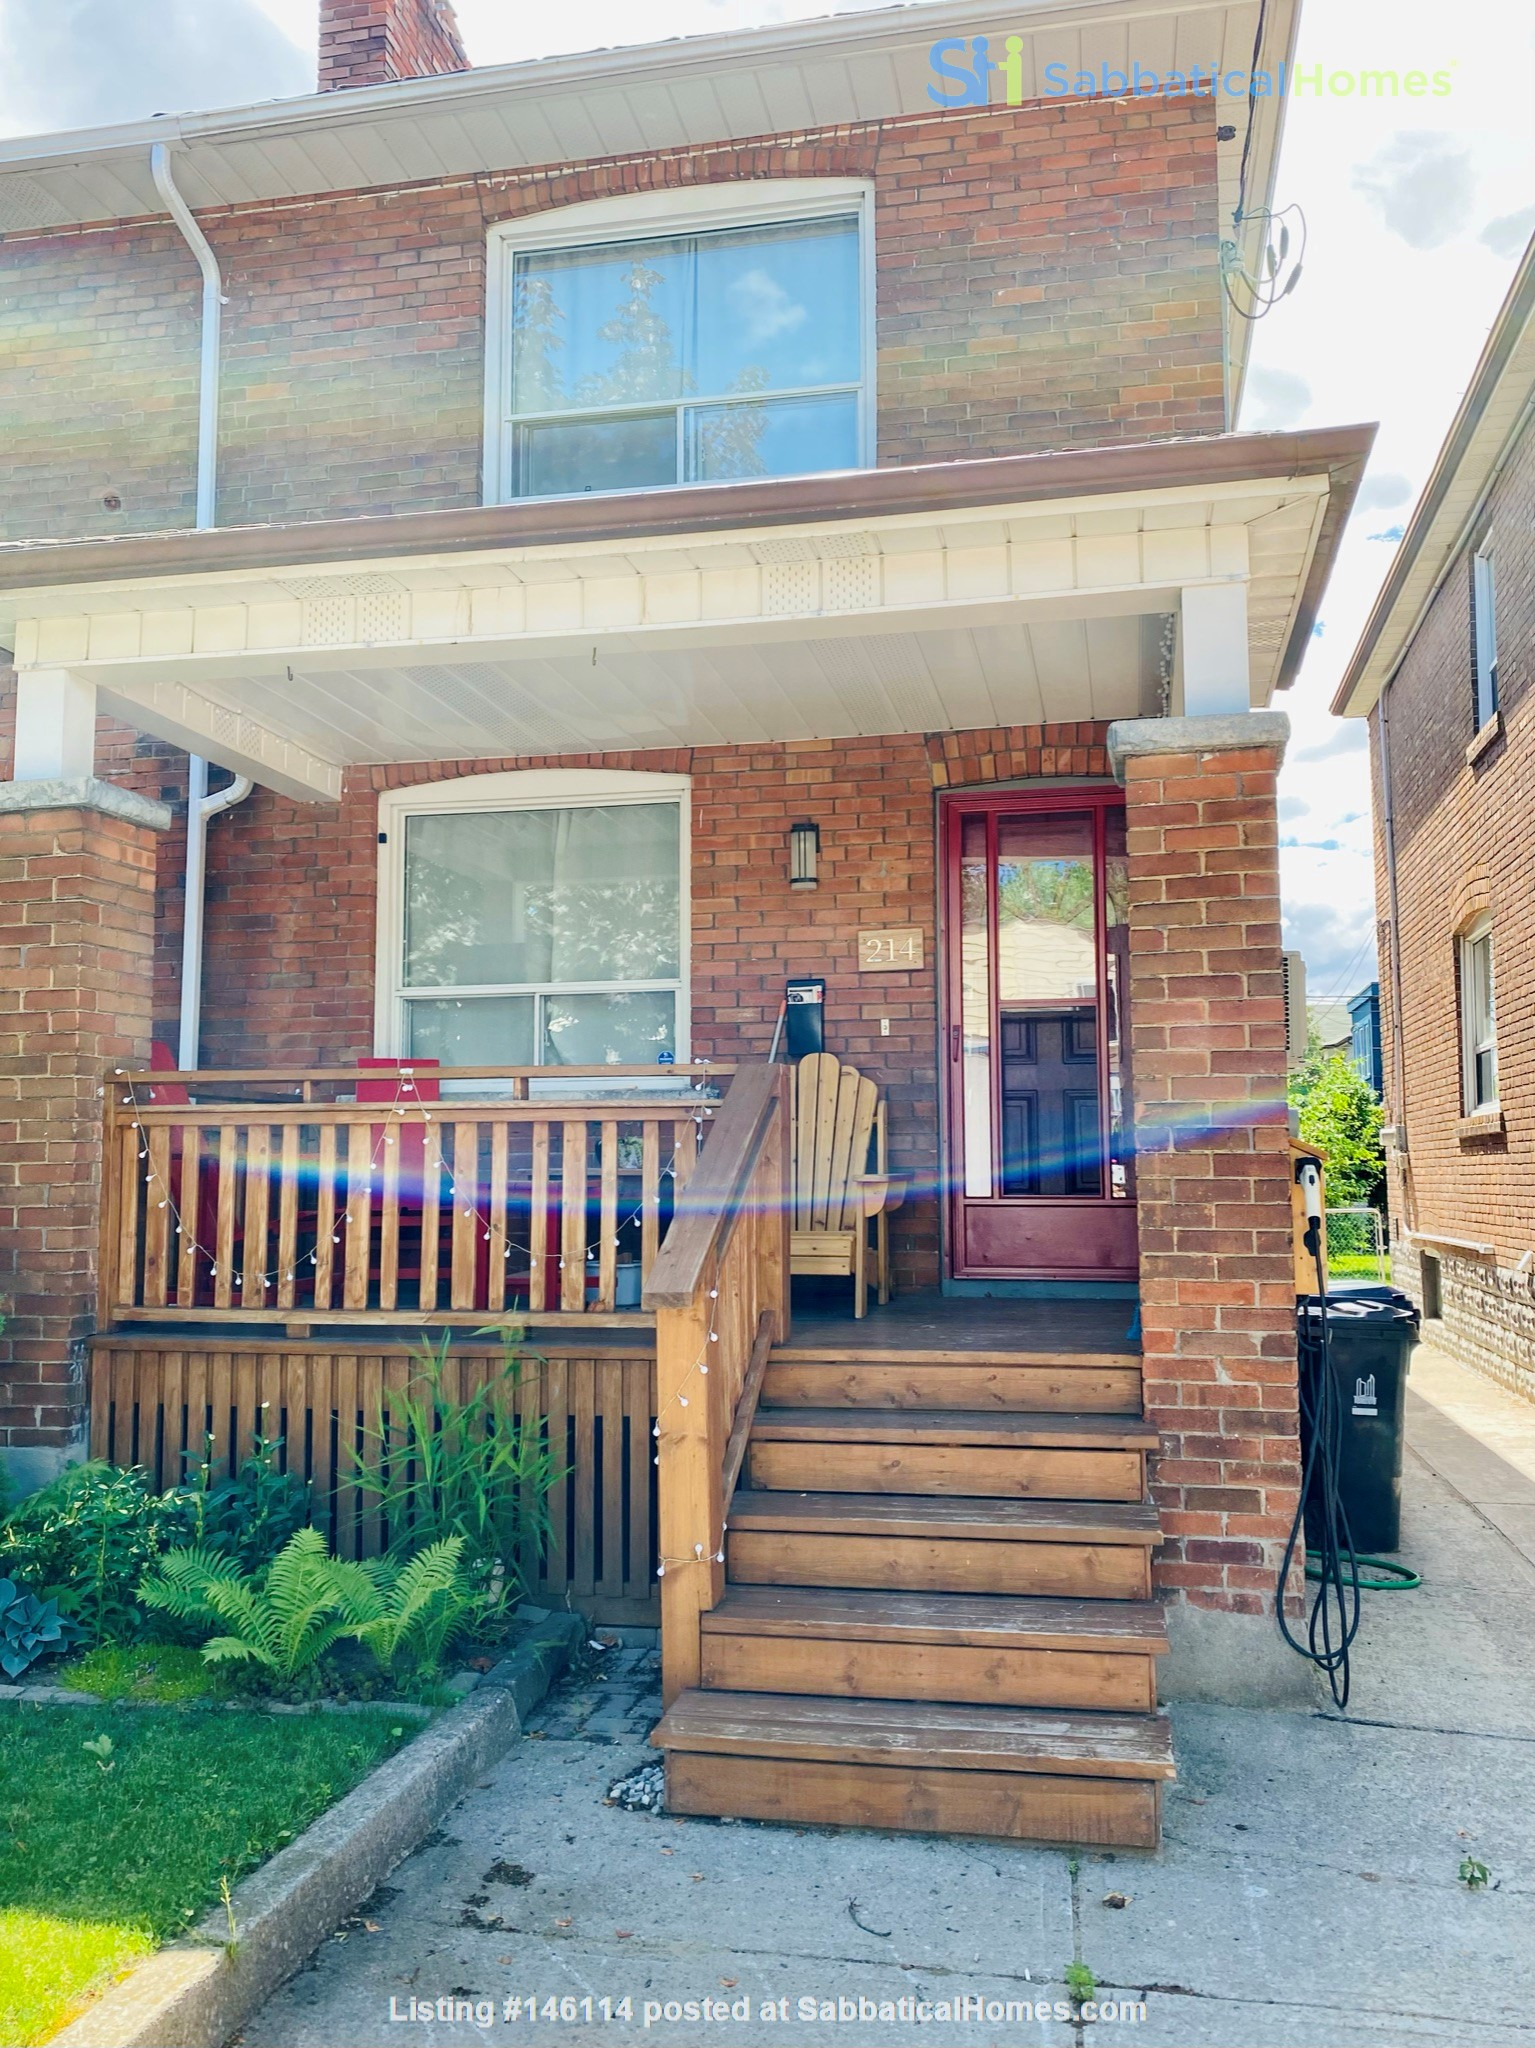 Charming 3 bdrm garden home for rent near The Danforth (w/backyard&parking) Home Rental in Toronto 1